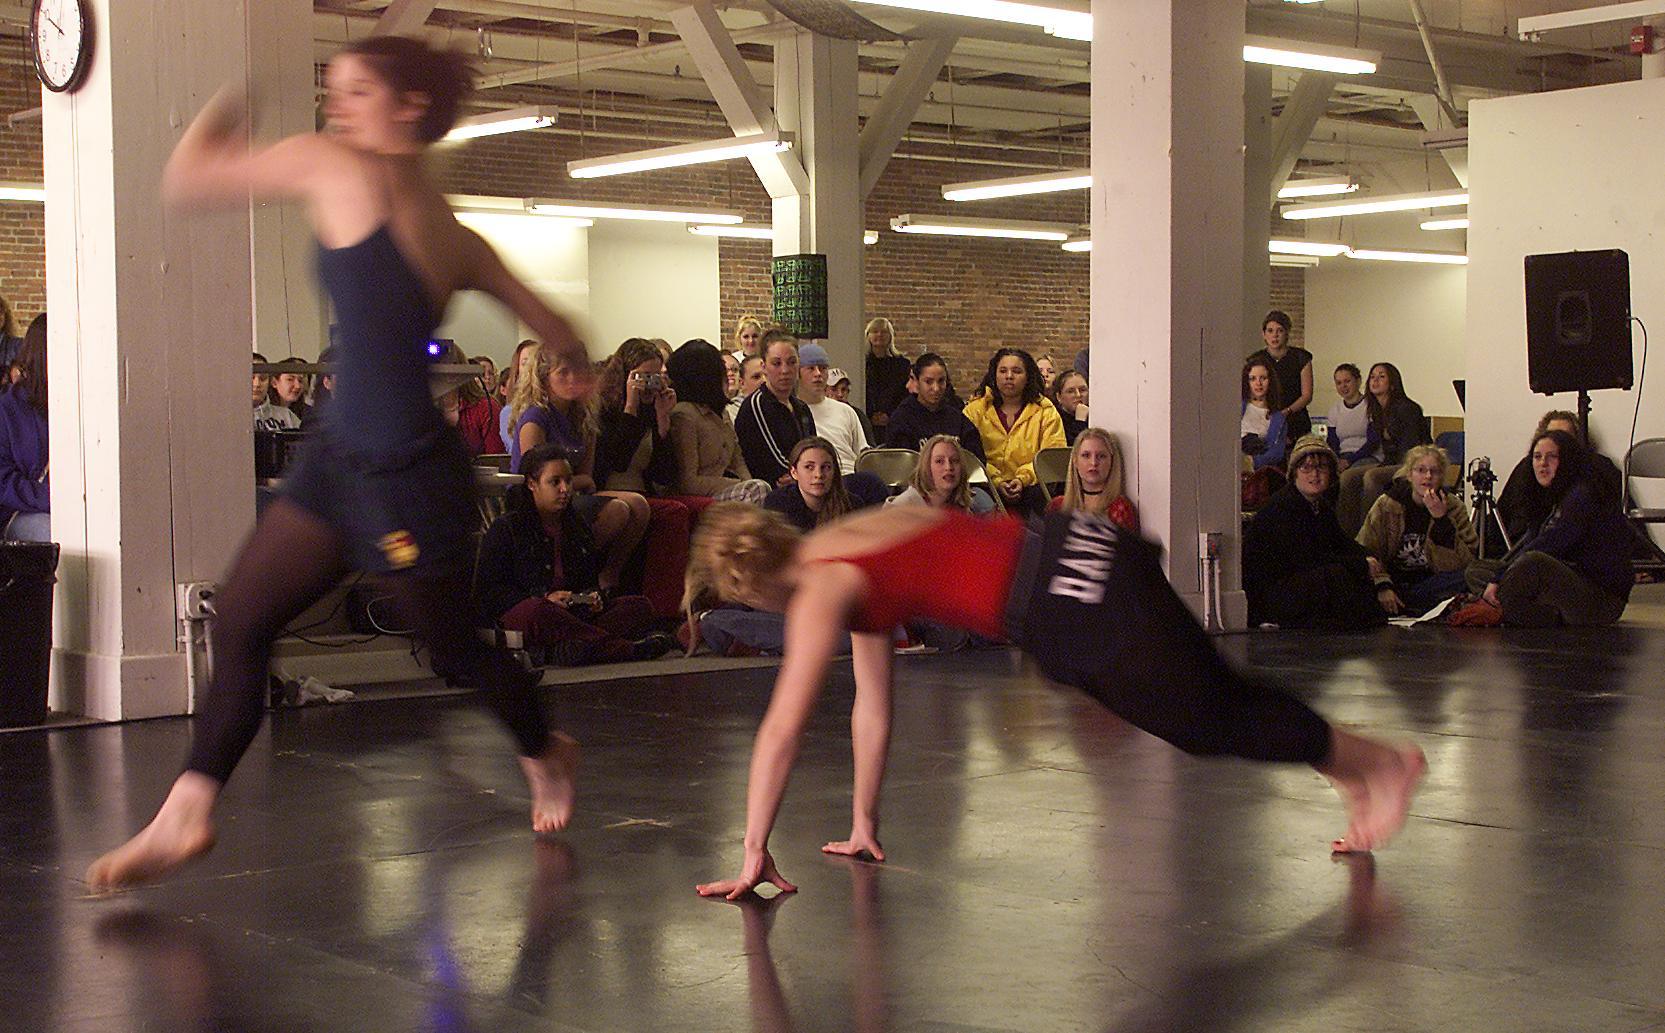 SOTA_Showcase_dance blur 2.jpg